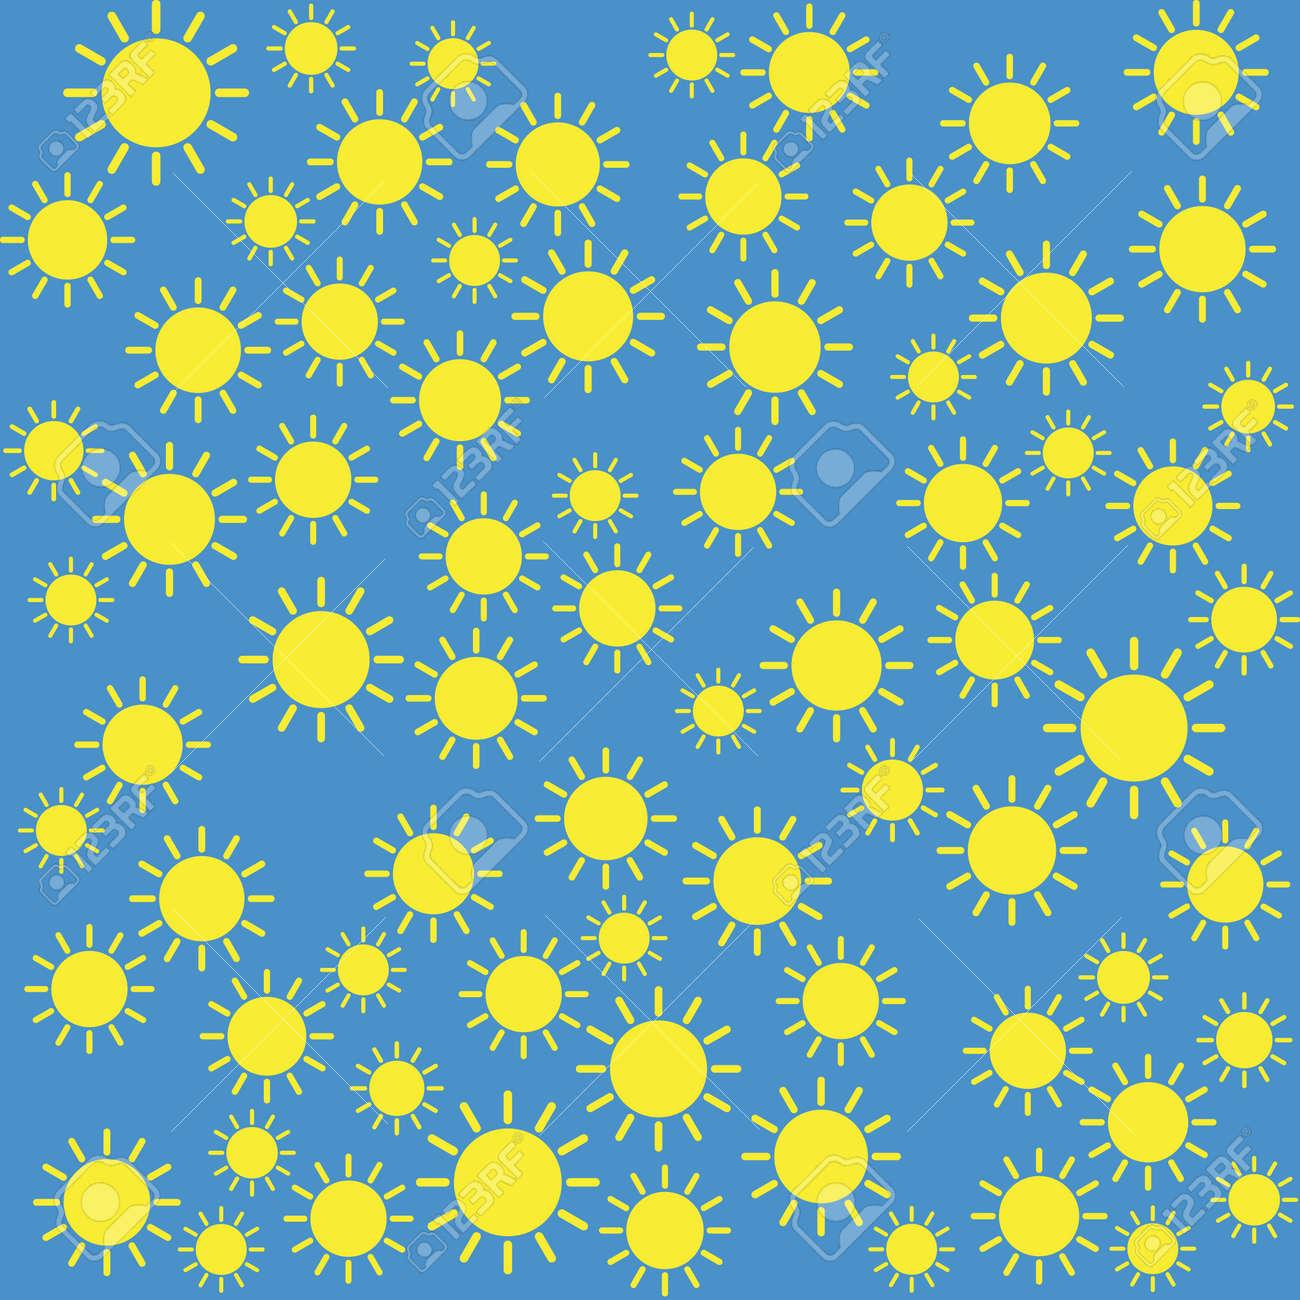 Yellow sun pattern on blue background. Stock Vector - 92884528